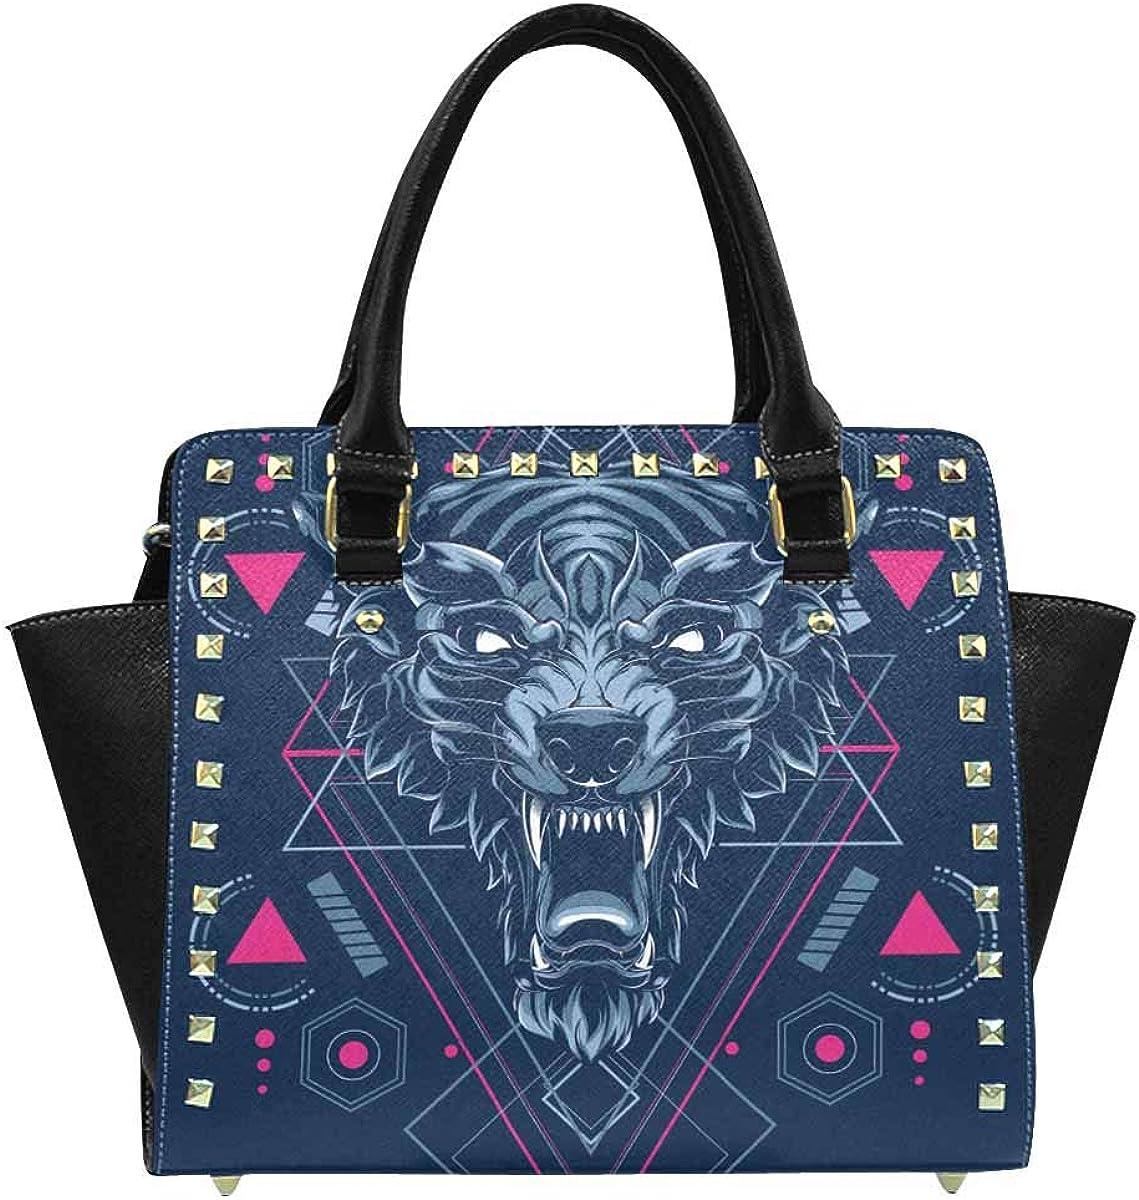 INTERESTPRINT Wolf Sacred Geometry Rive Shoulder Bags Satchel Handbags for Women Fashion Ladies